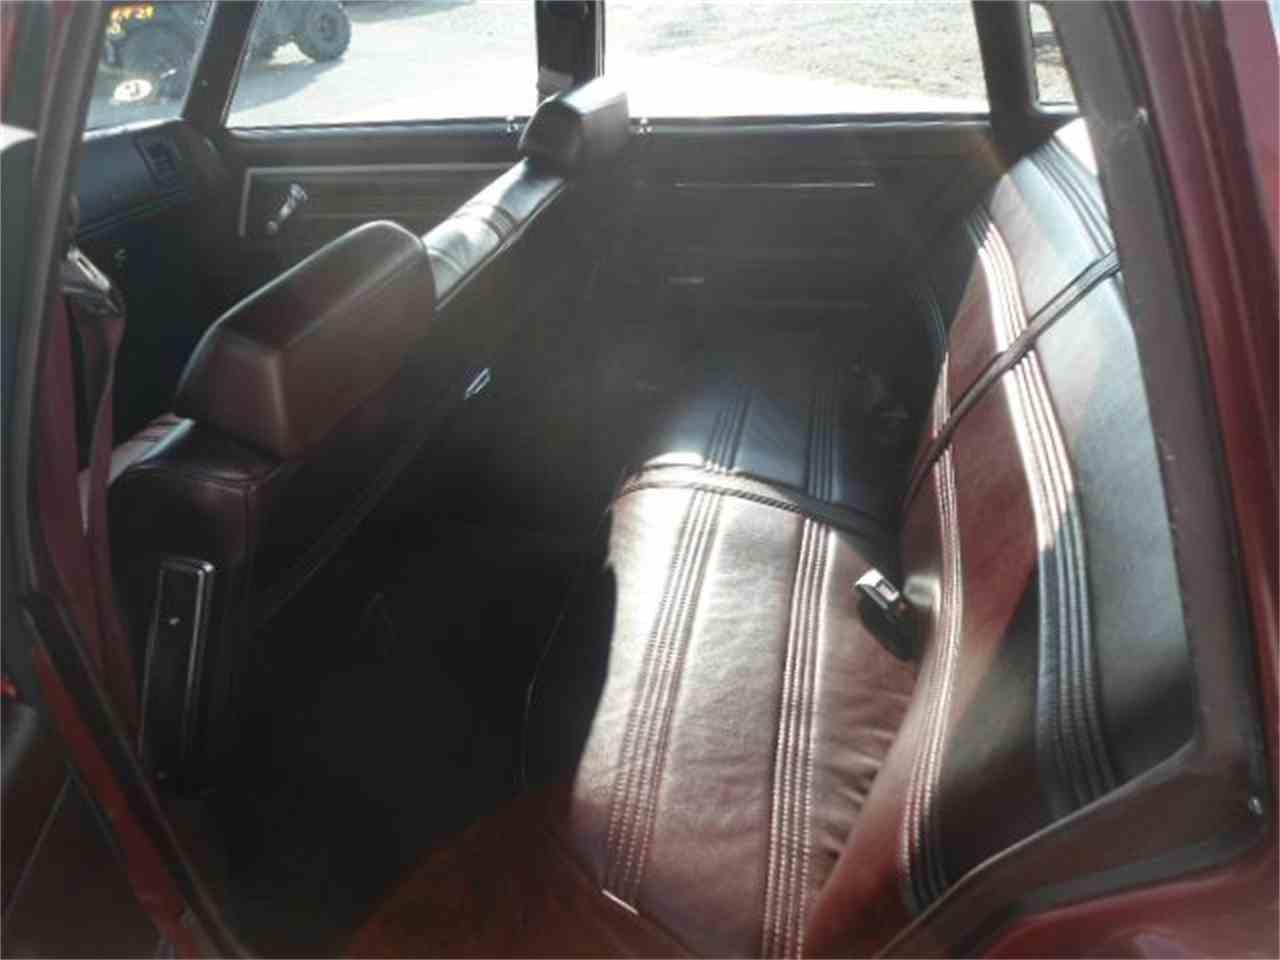 Malibu 1980 chevrolet malibu listings : 1980 Chevrolet Malibu for Sale | ClassicCars.com | CC-938661